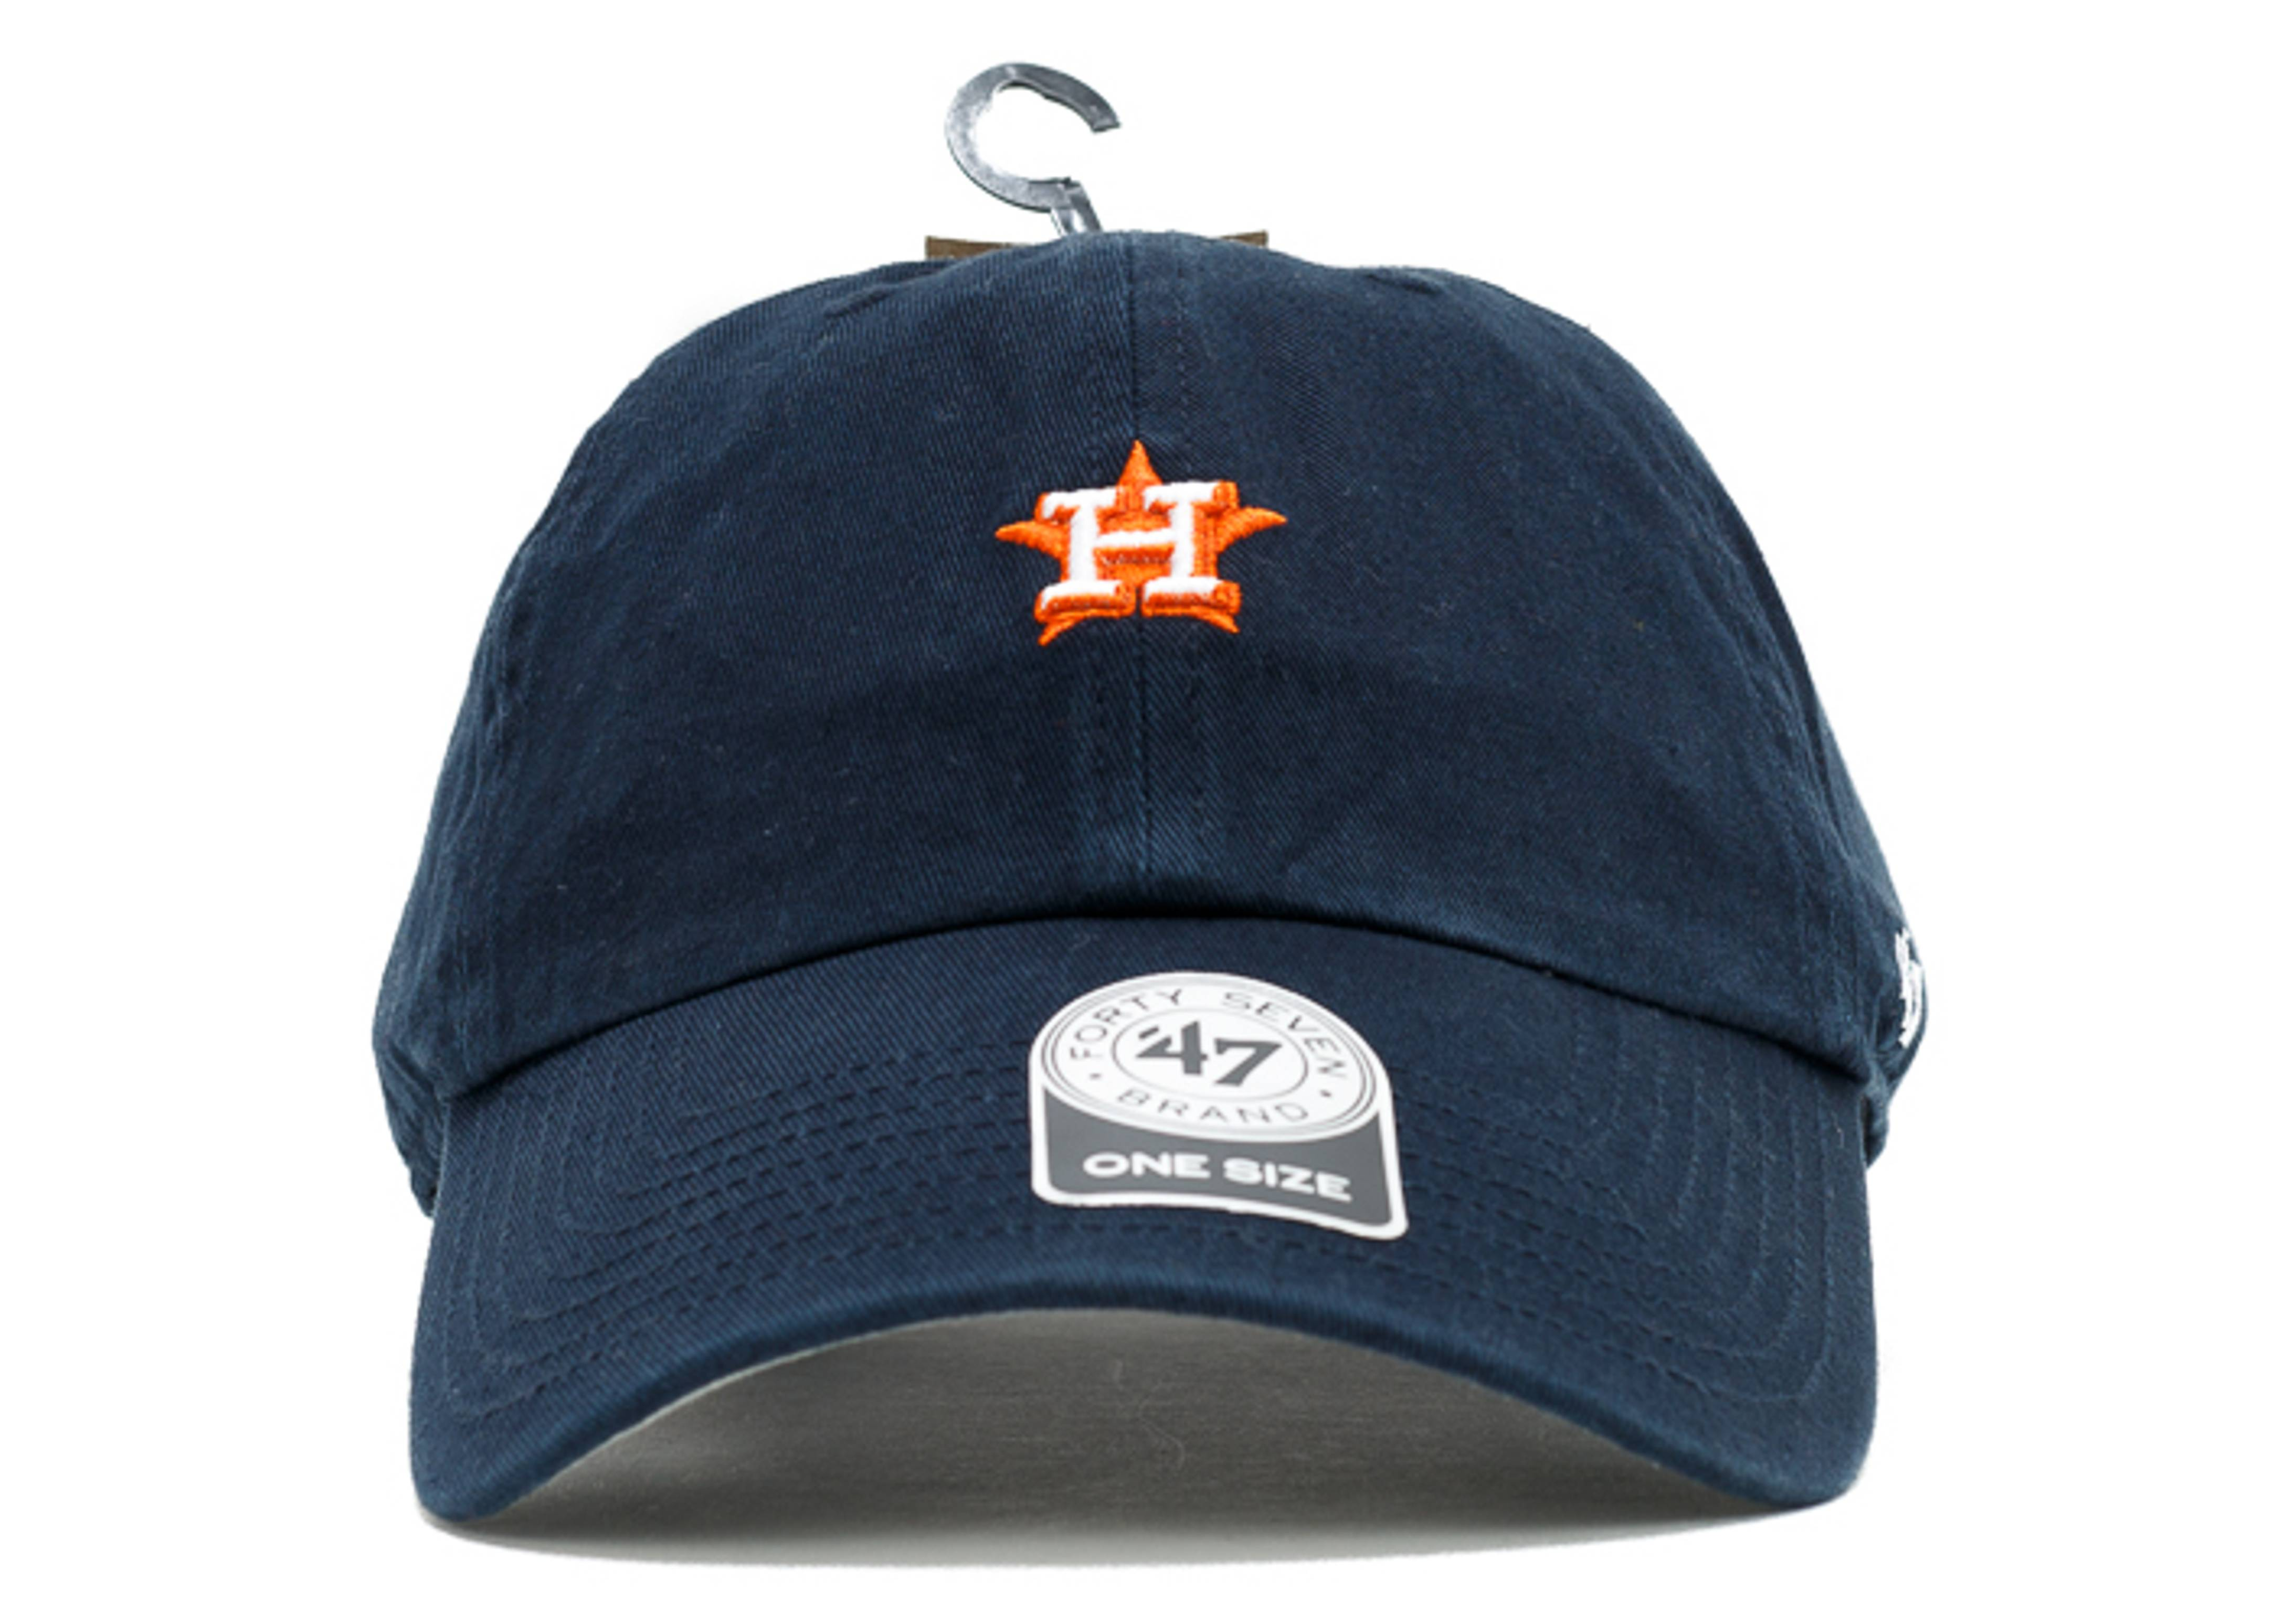 7e47bda685ee8 Houston Astros Strap-back